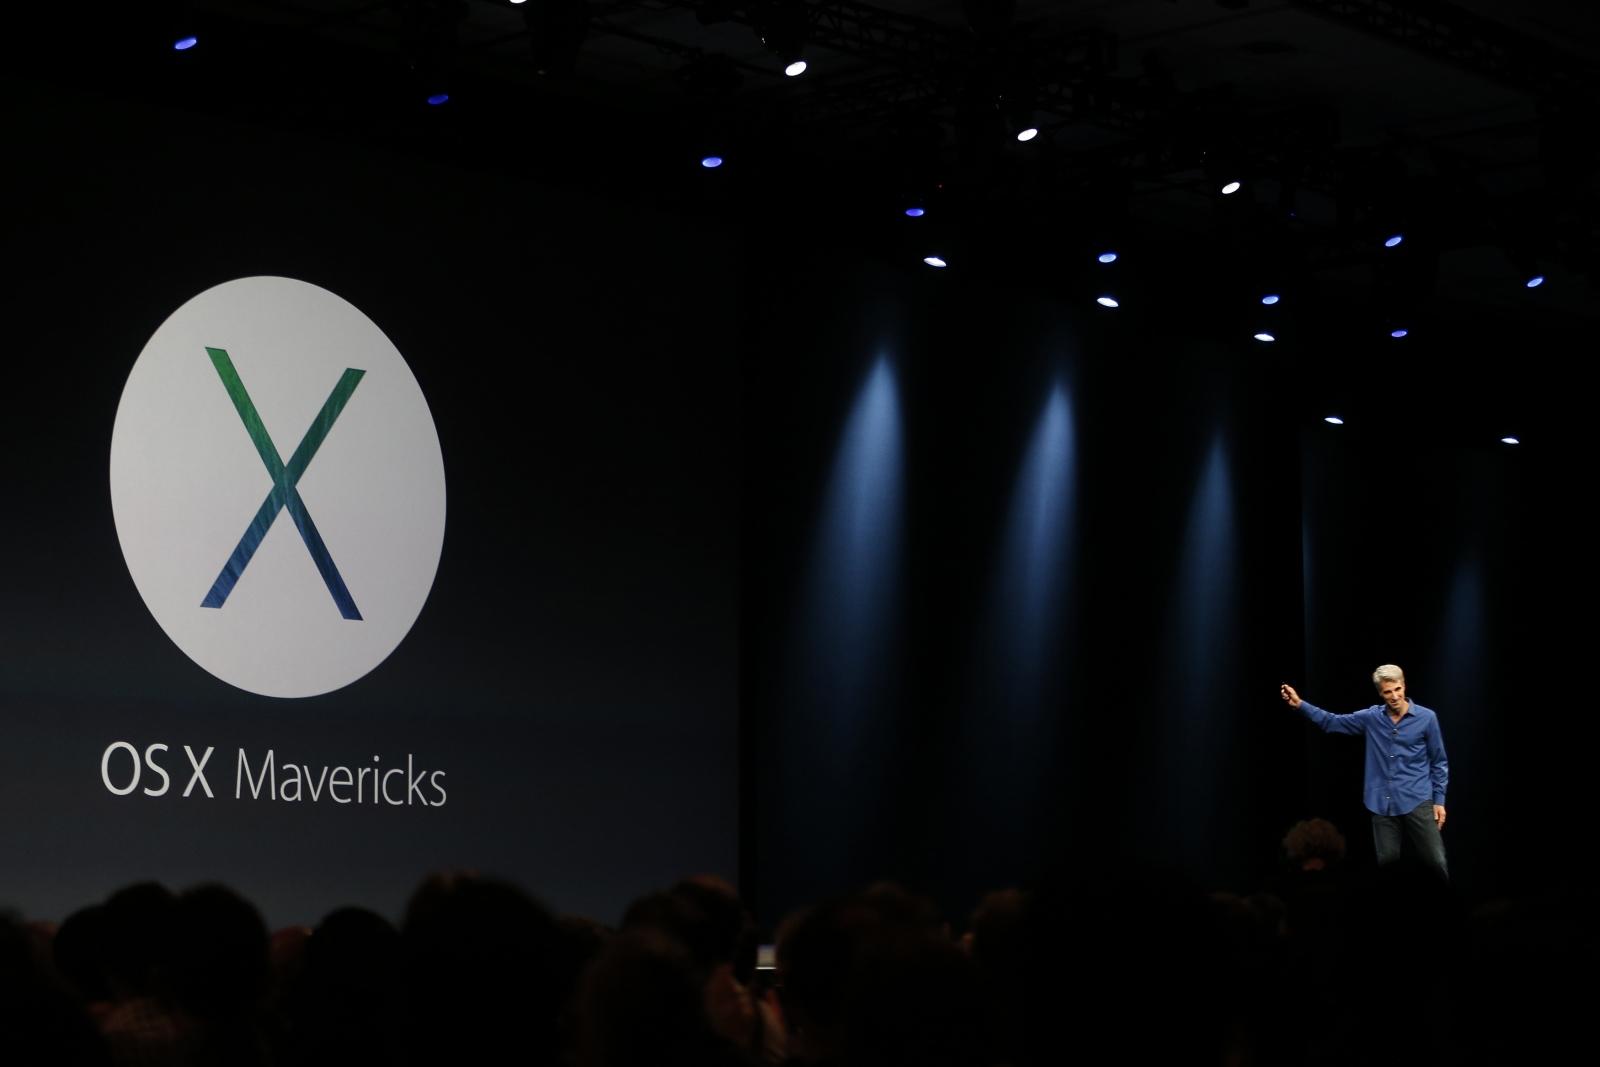 Mac OS X Mavericks Vulnerable to Shellshock